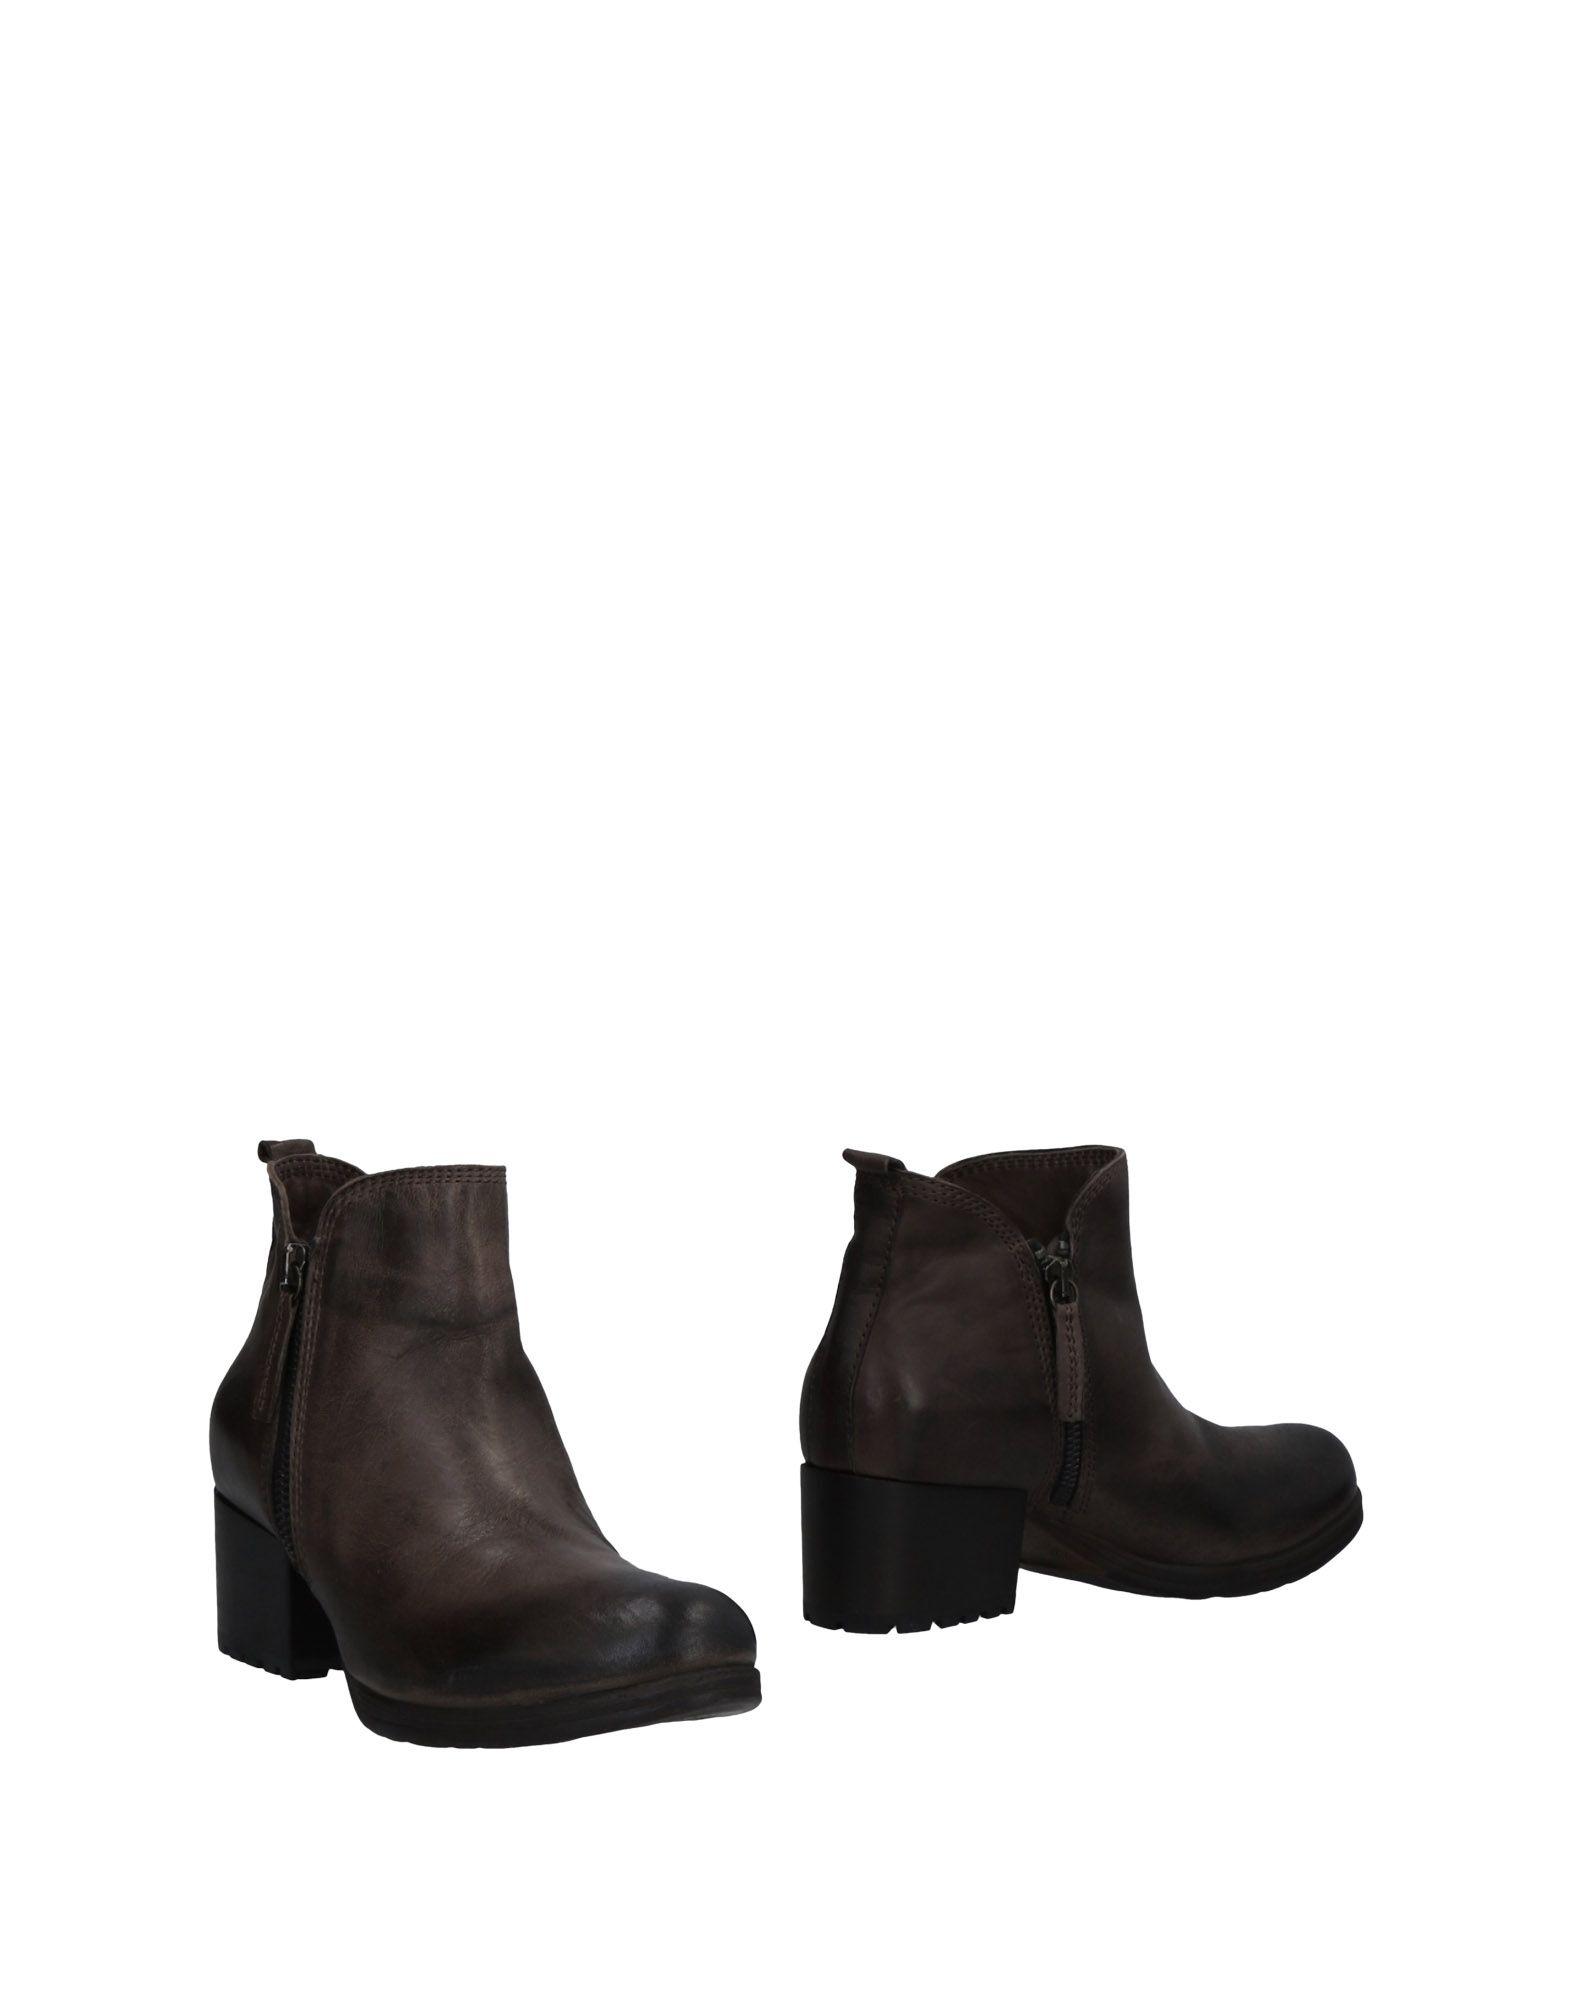 Stilvolle billige Stiefelette Schuhe Studio By Volpato Stiefelette billige Damen  11486874SE 224085